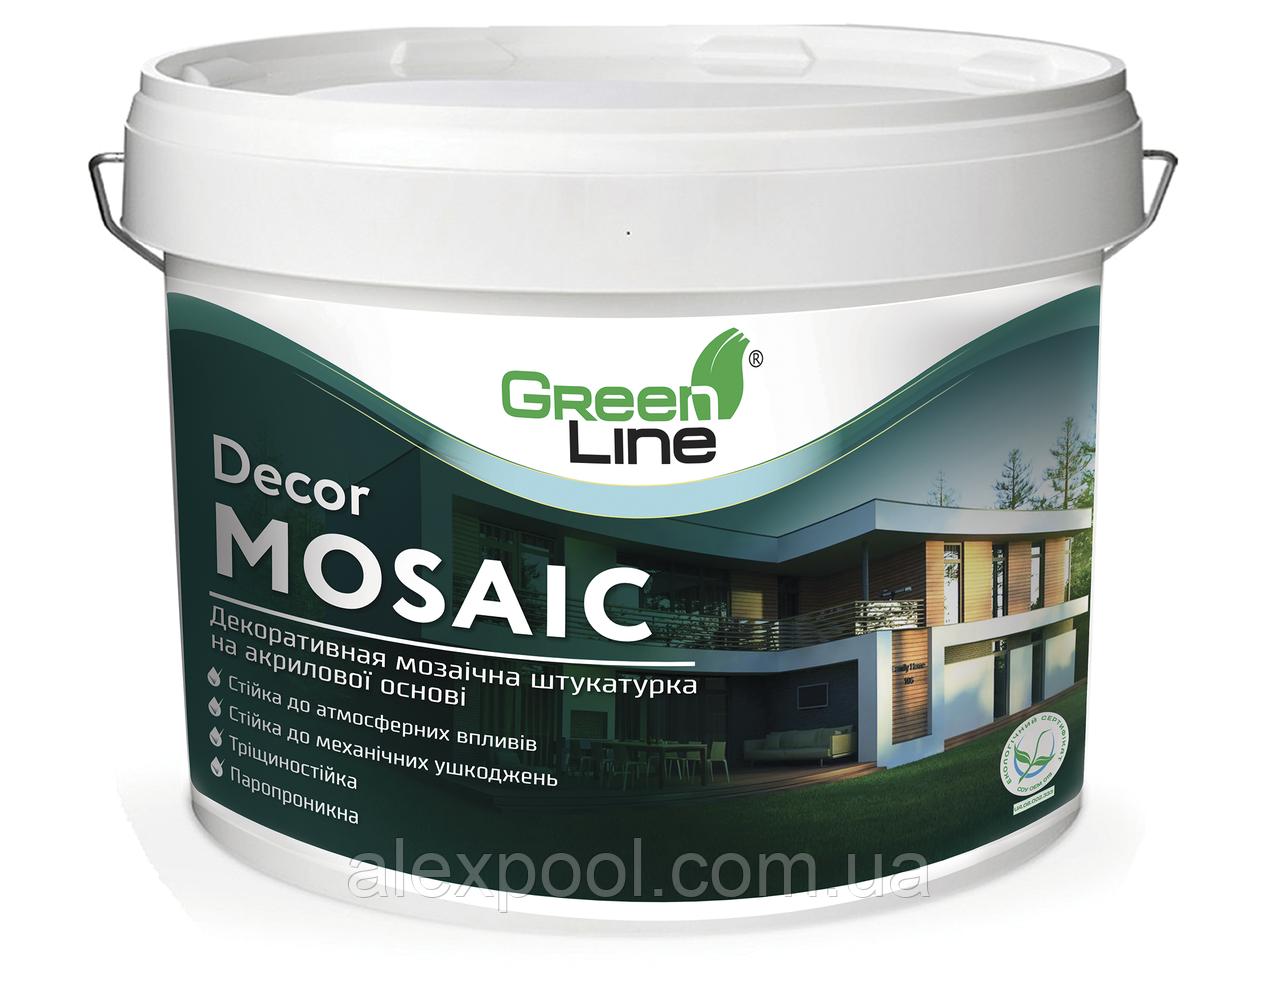 Декоративная мозаичная штукатурка DECOR MOSAIC 10 л